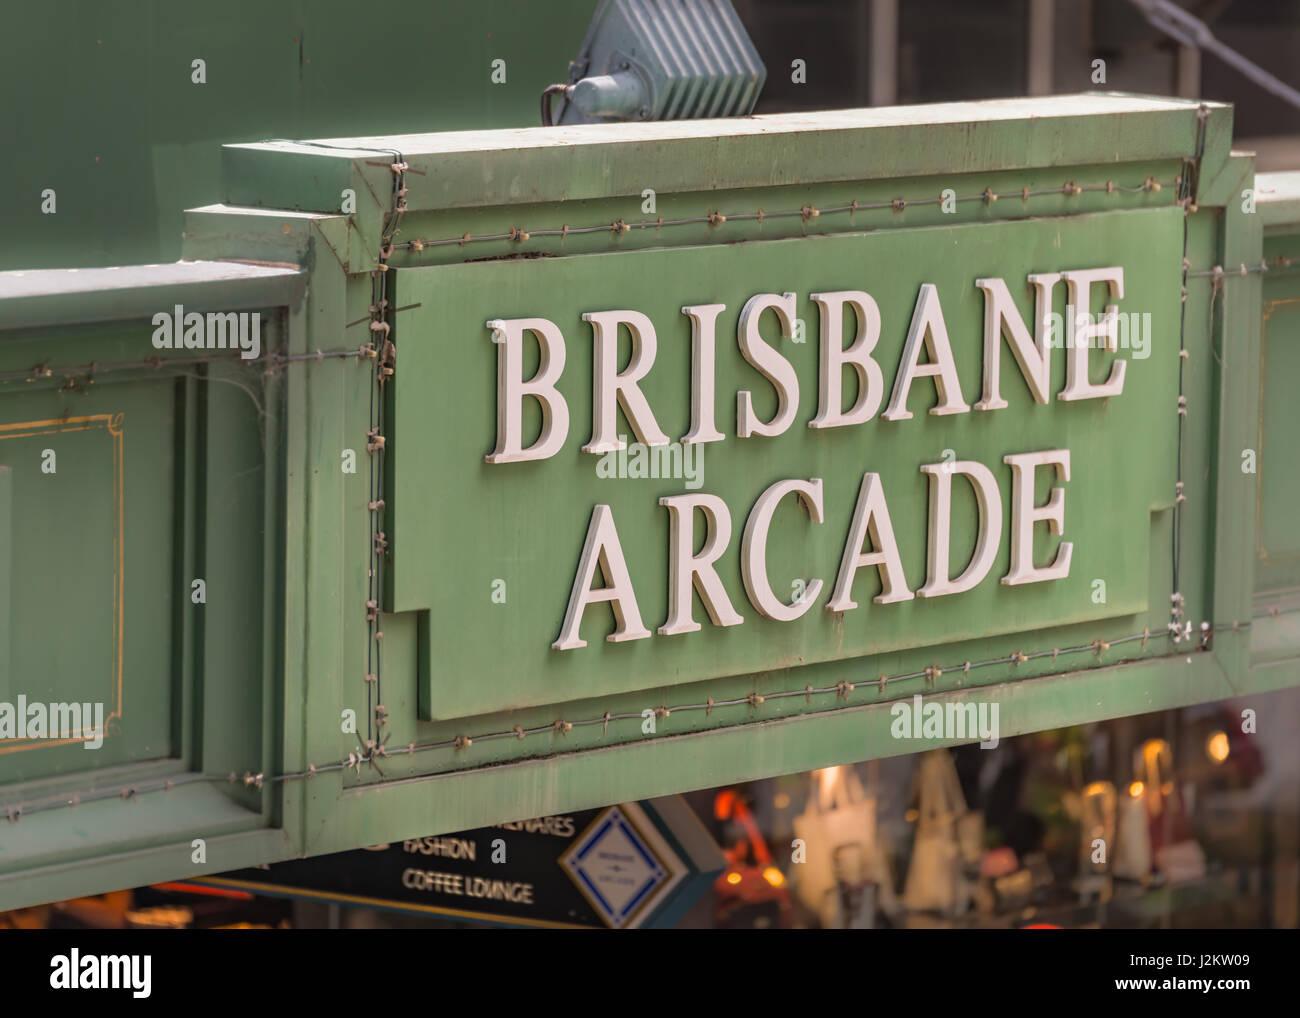 Brisbane Arcade in Brisbane CBD, Queensland, Australia - Stock Image